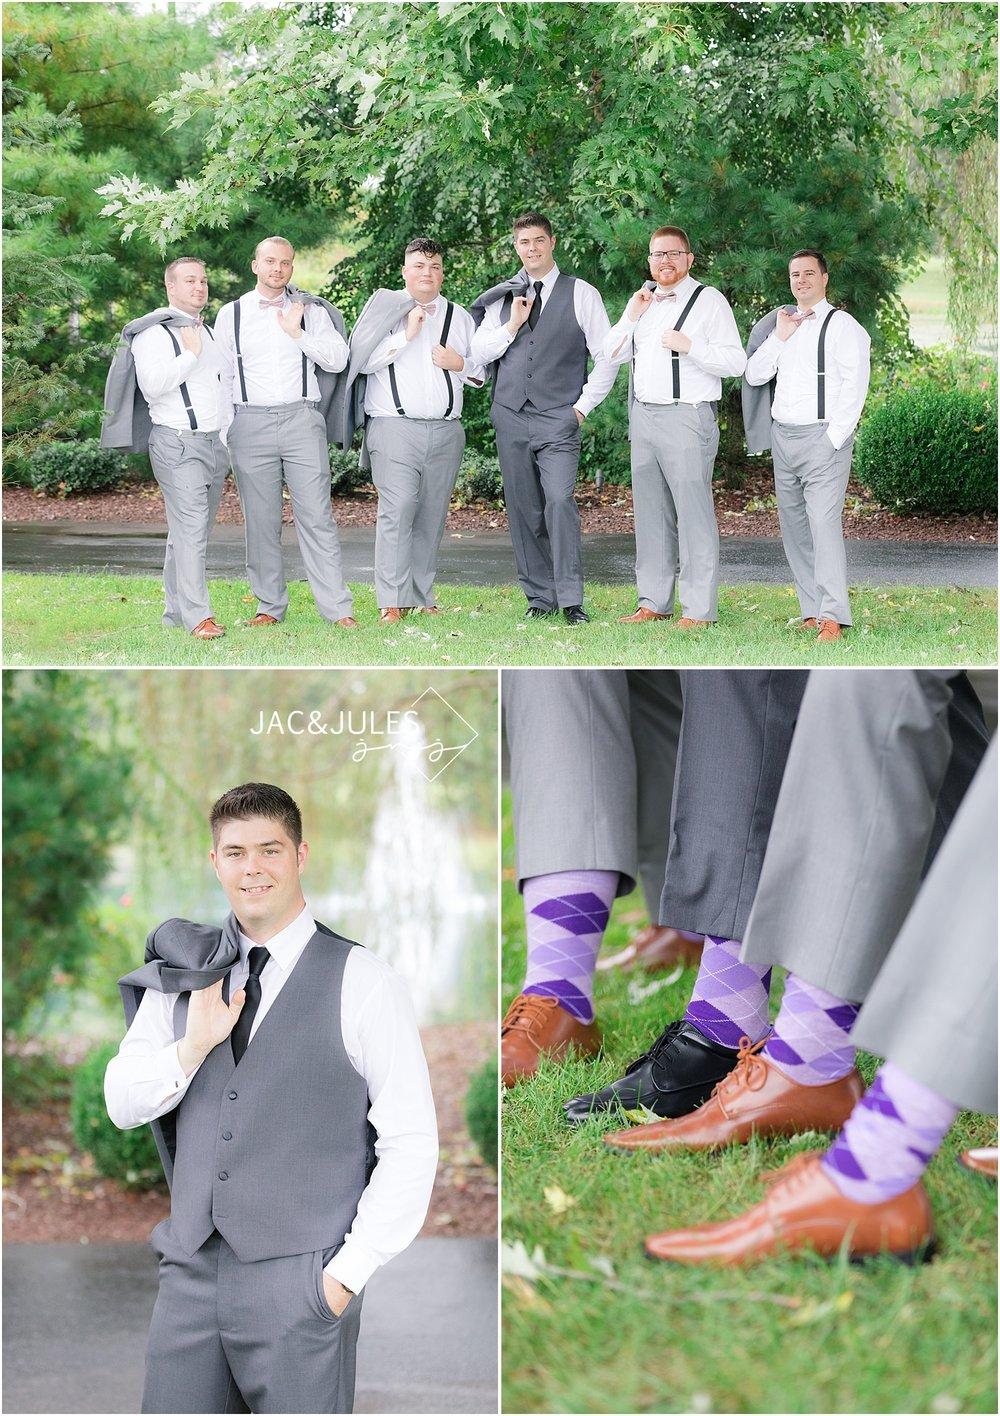 fun groomsmen photo at frogbridge with suspenders